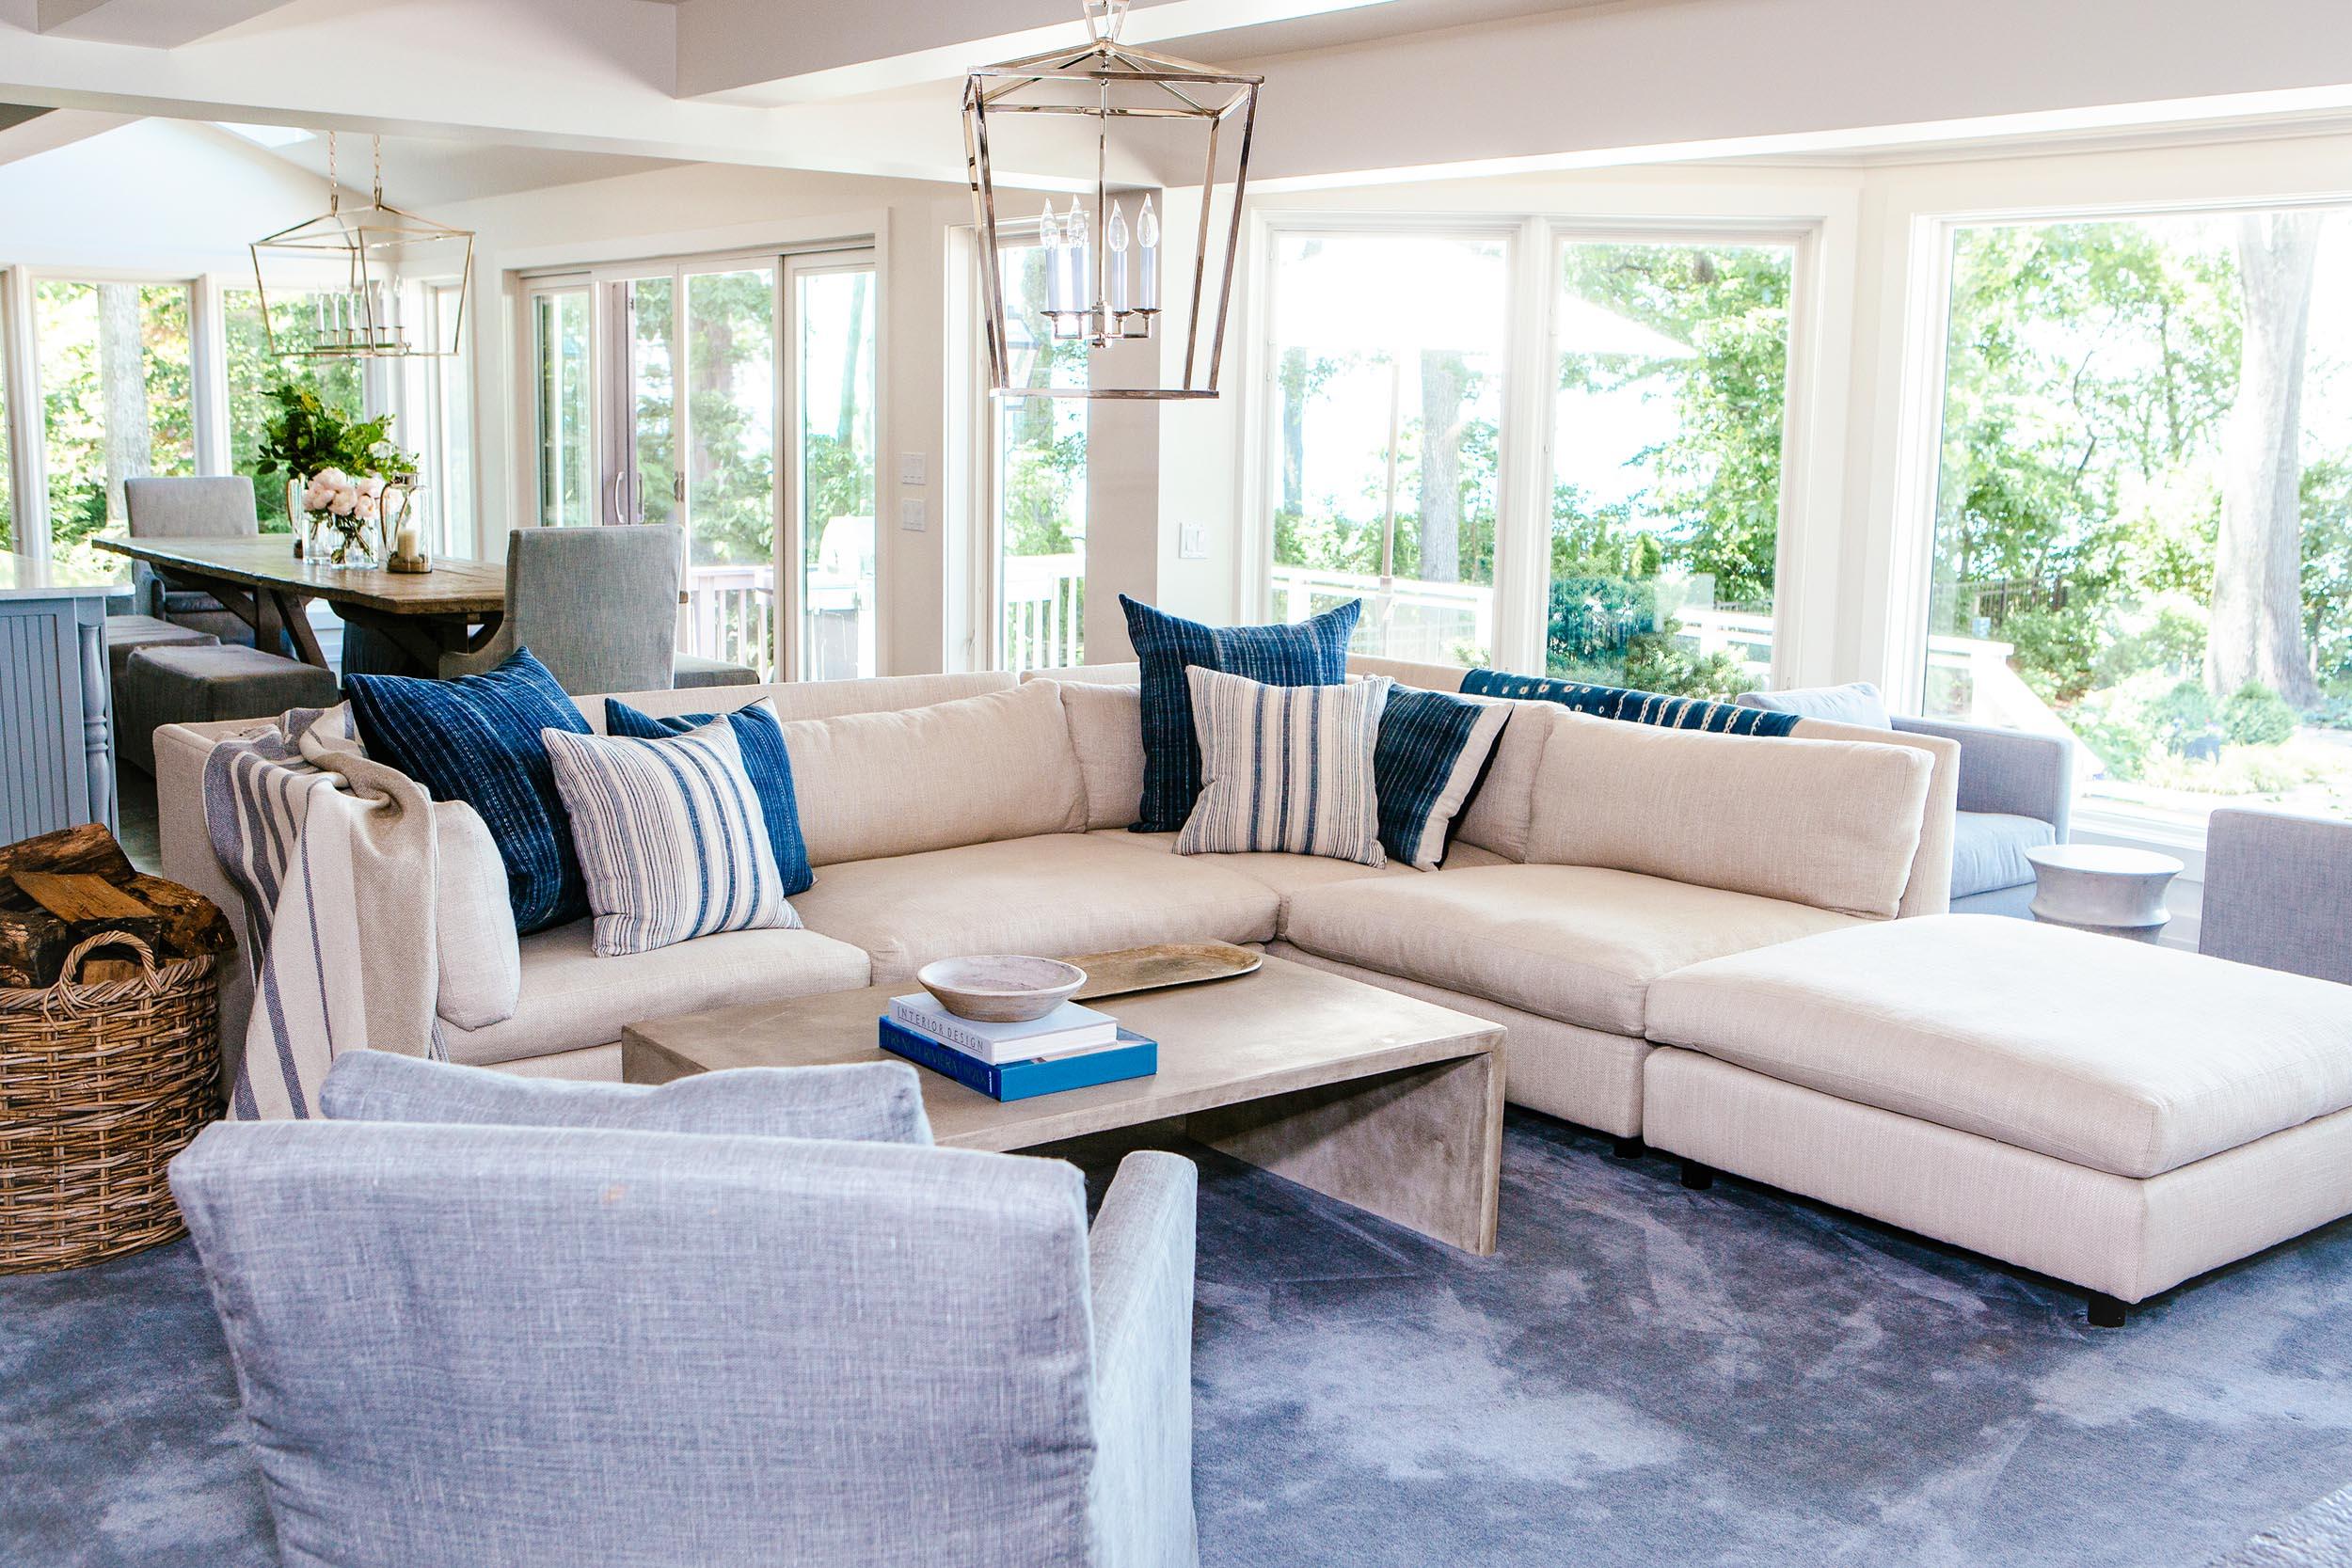 Leo_Designs_Chicago_interior_design_indigo_dreams_beach_house7.jpg